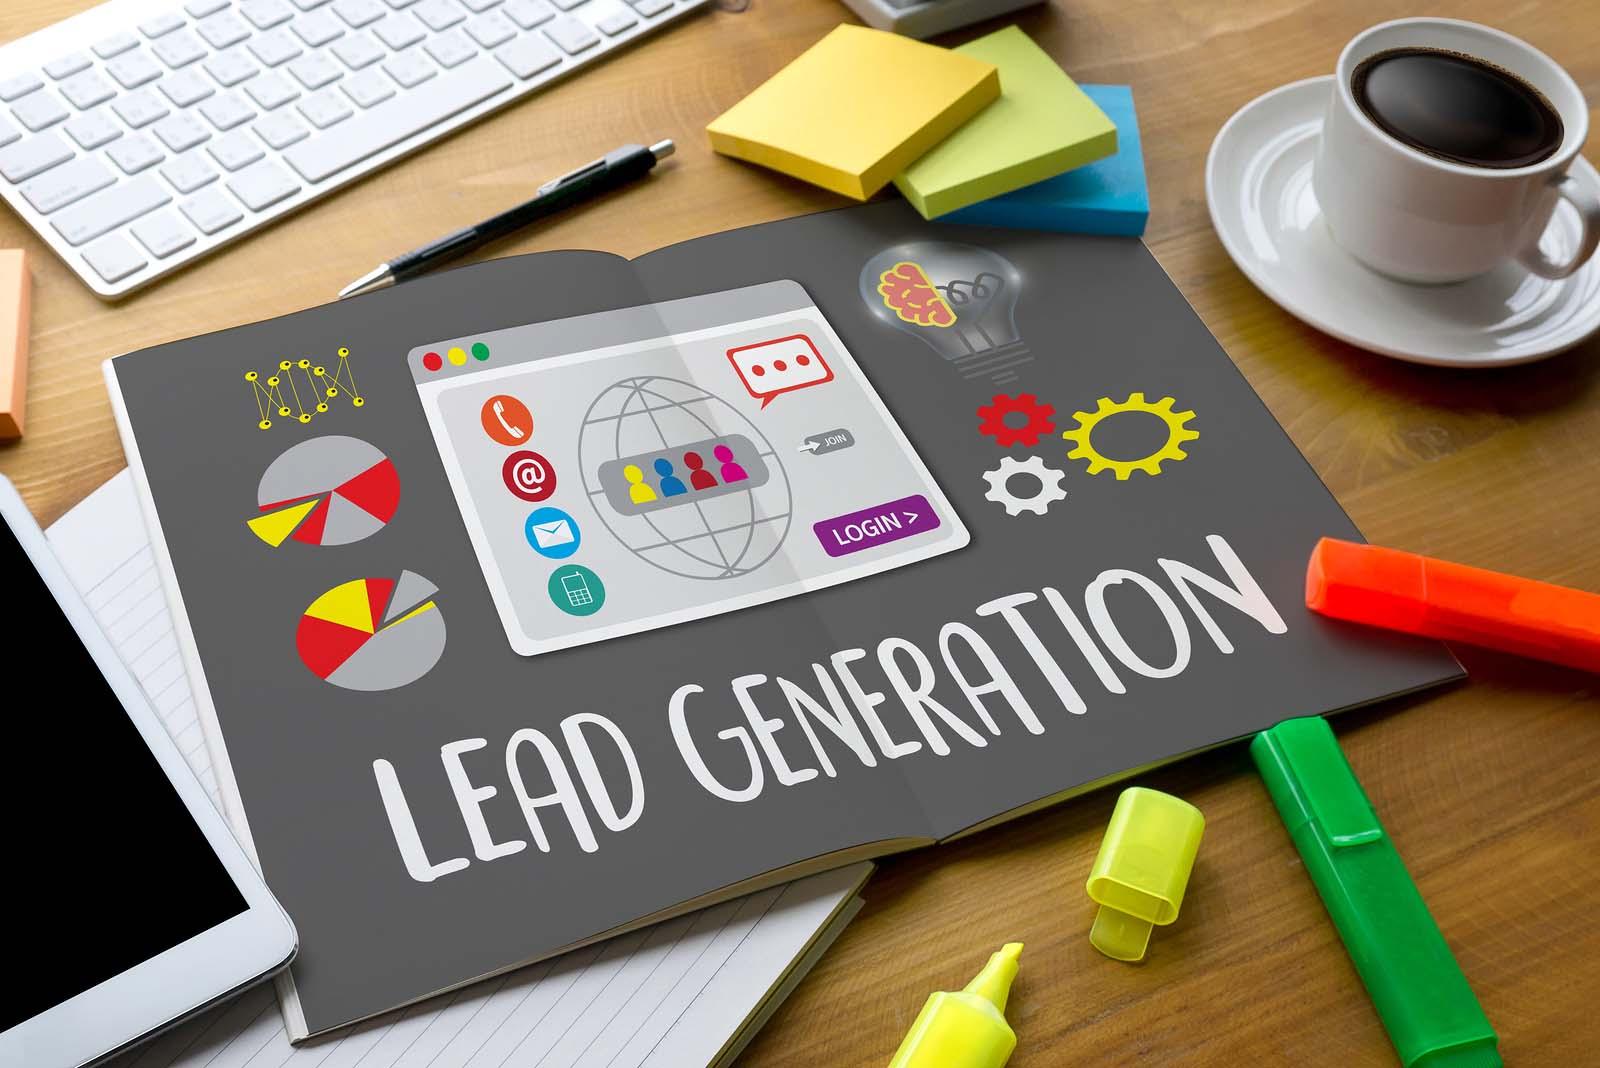 LEAD GENERATION Lead Generation Business Funnel Sales funnel marketing process Lead generation lead generation internet marketing for online market Lead Generation Interest Marketing Business